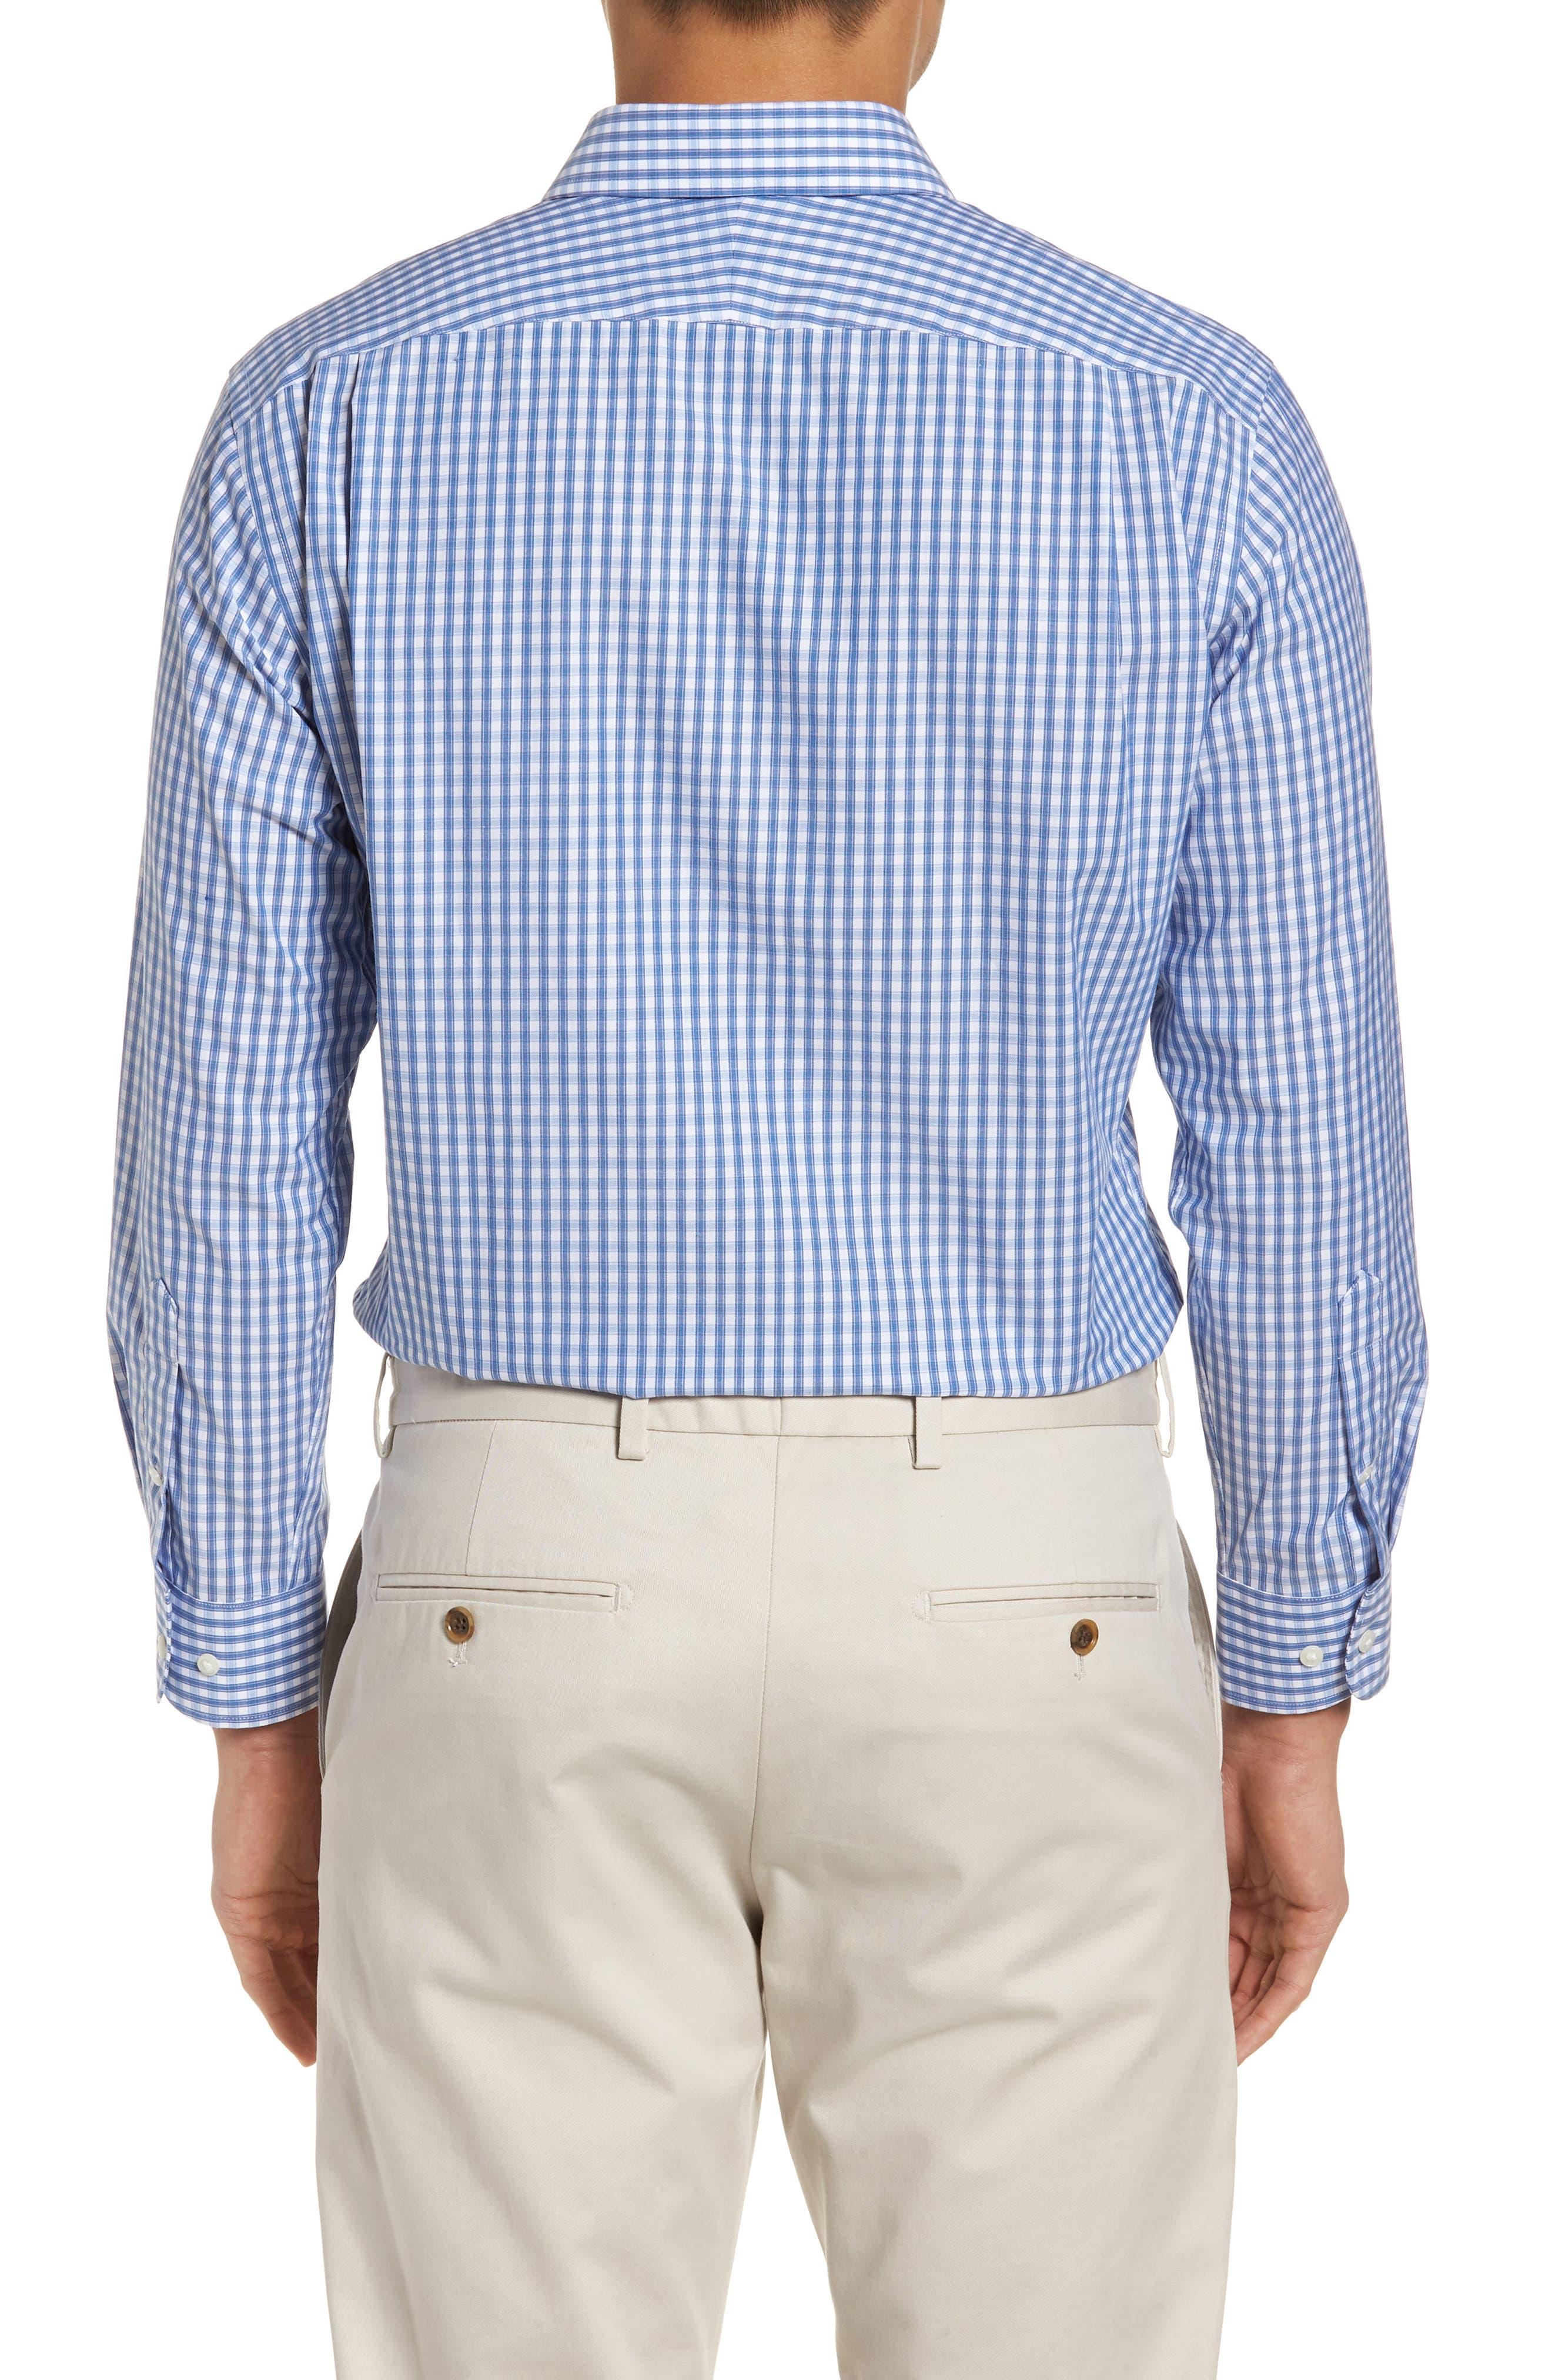 Alternate Image 2  - Nordstrom Men's Shop Trim Fit Non-Iron Check Dress Shirt